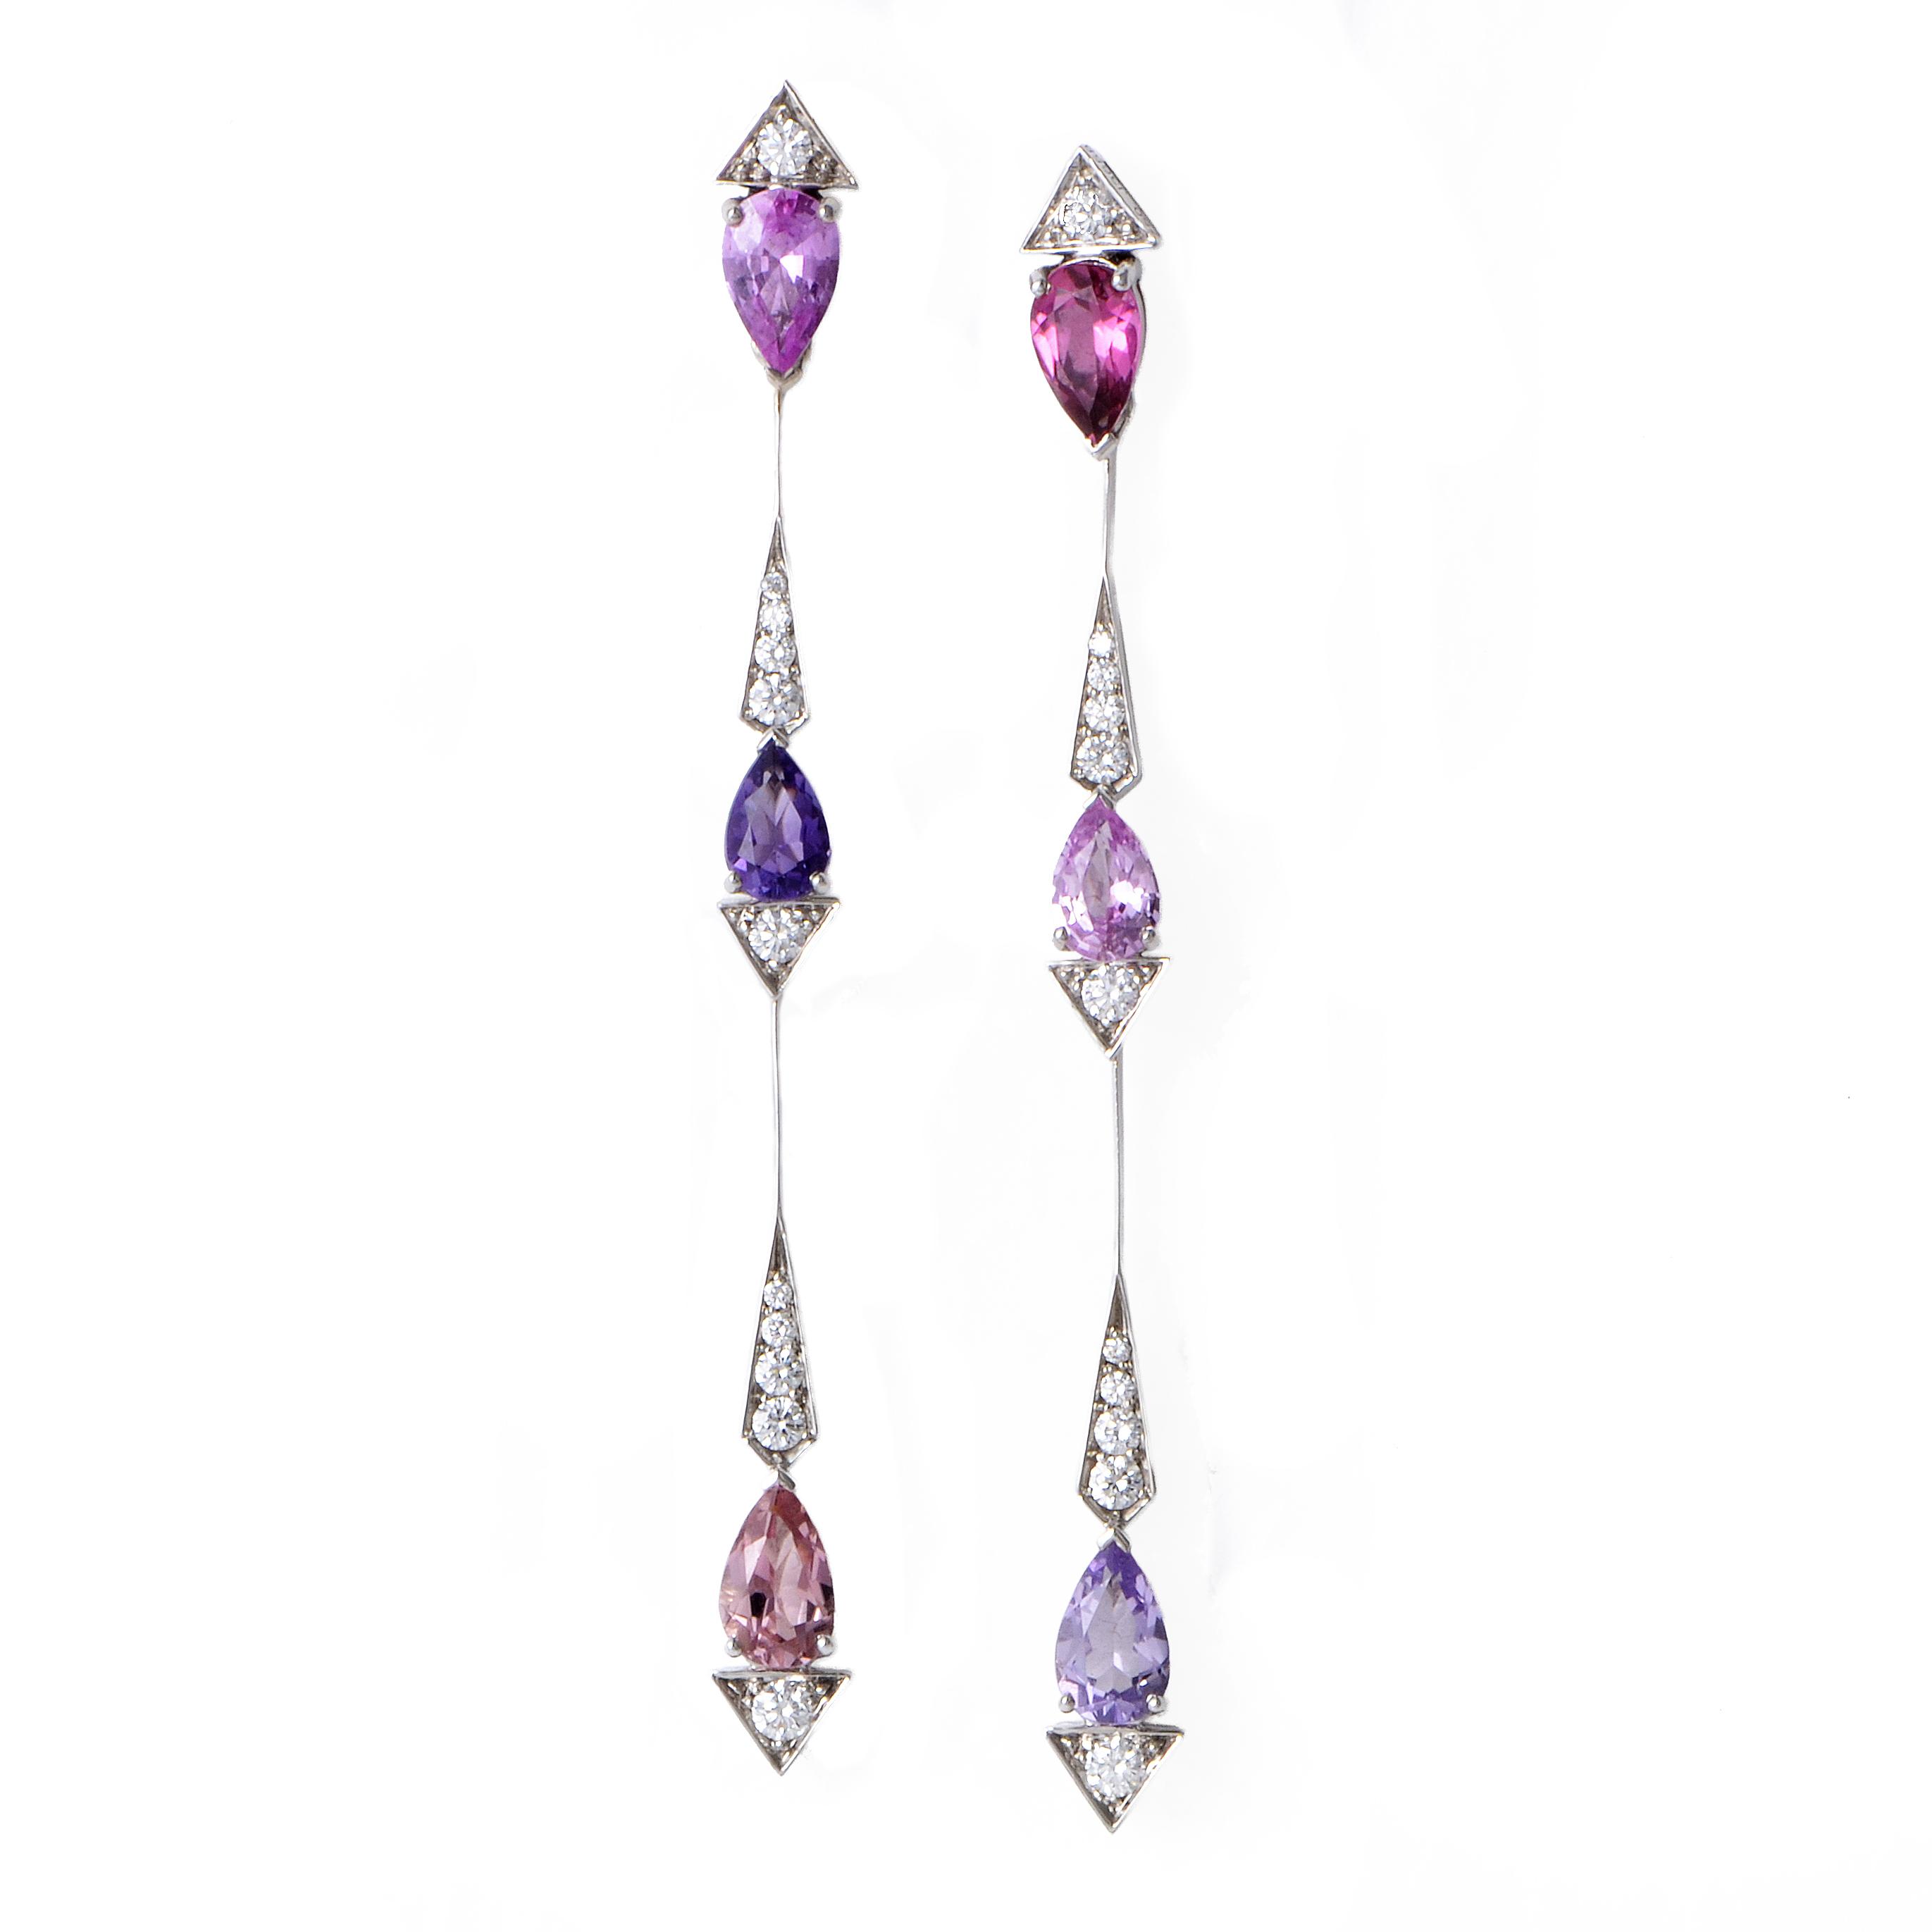 Pluie d'Été Women's 18K White Gold Diamond & Multi-Gemstone Drop Earrings